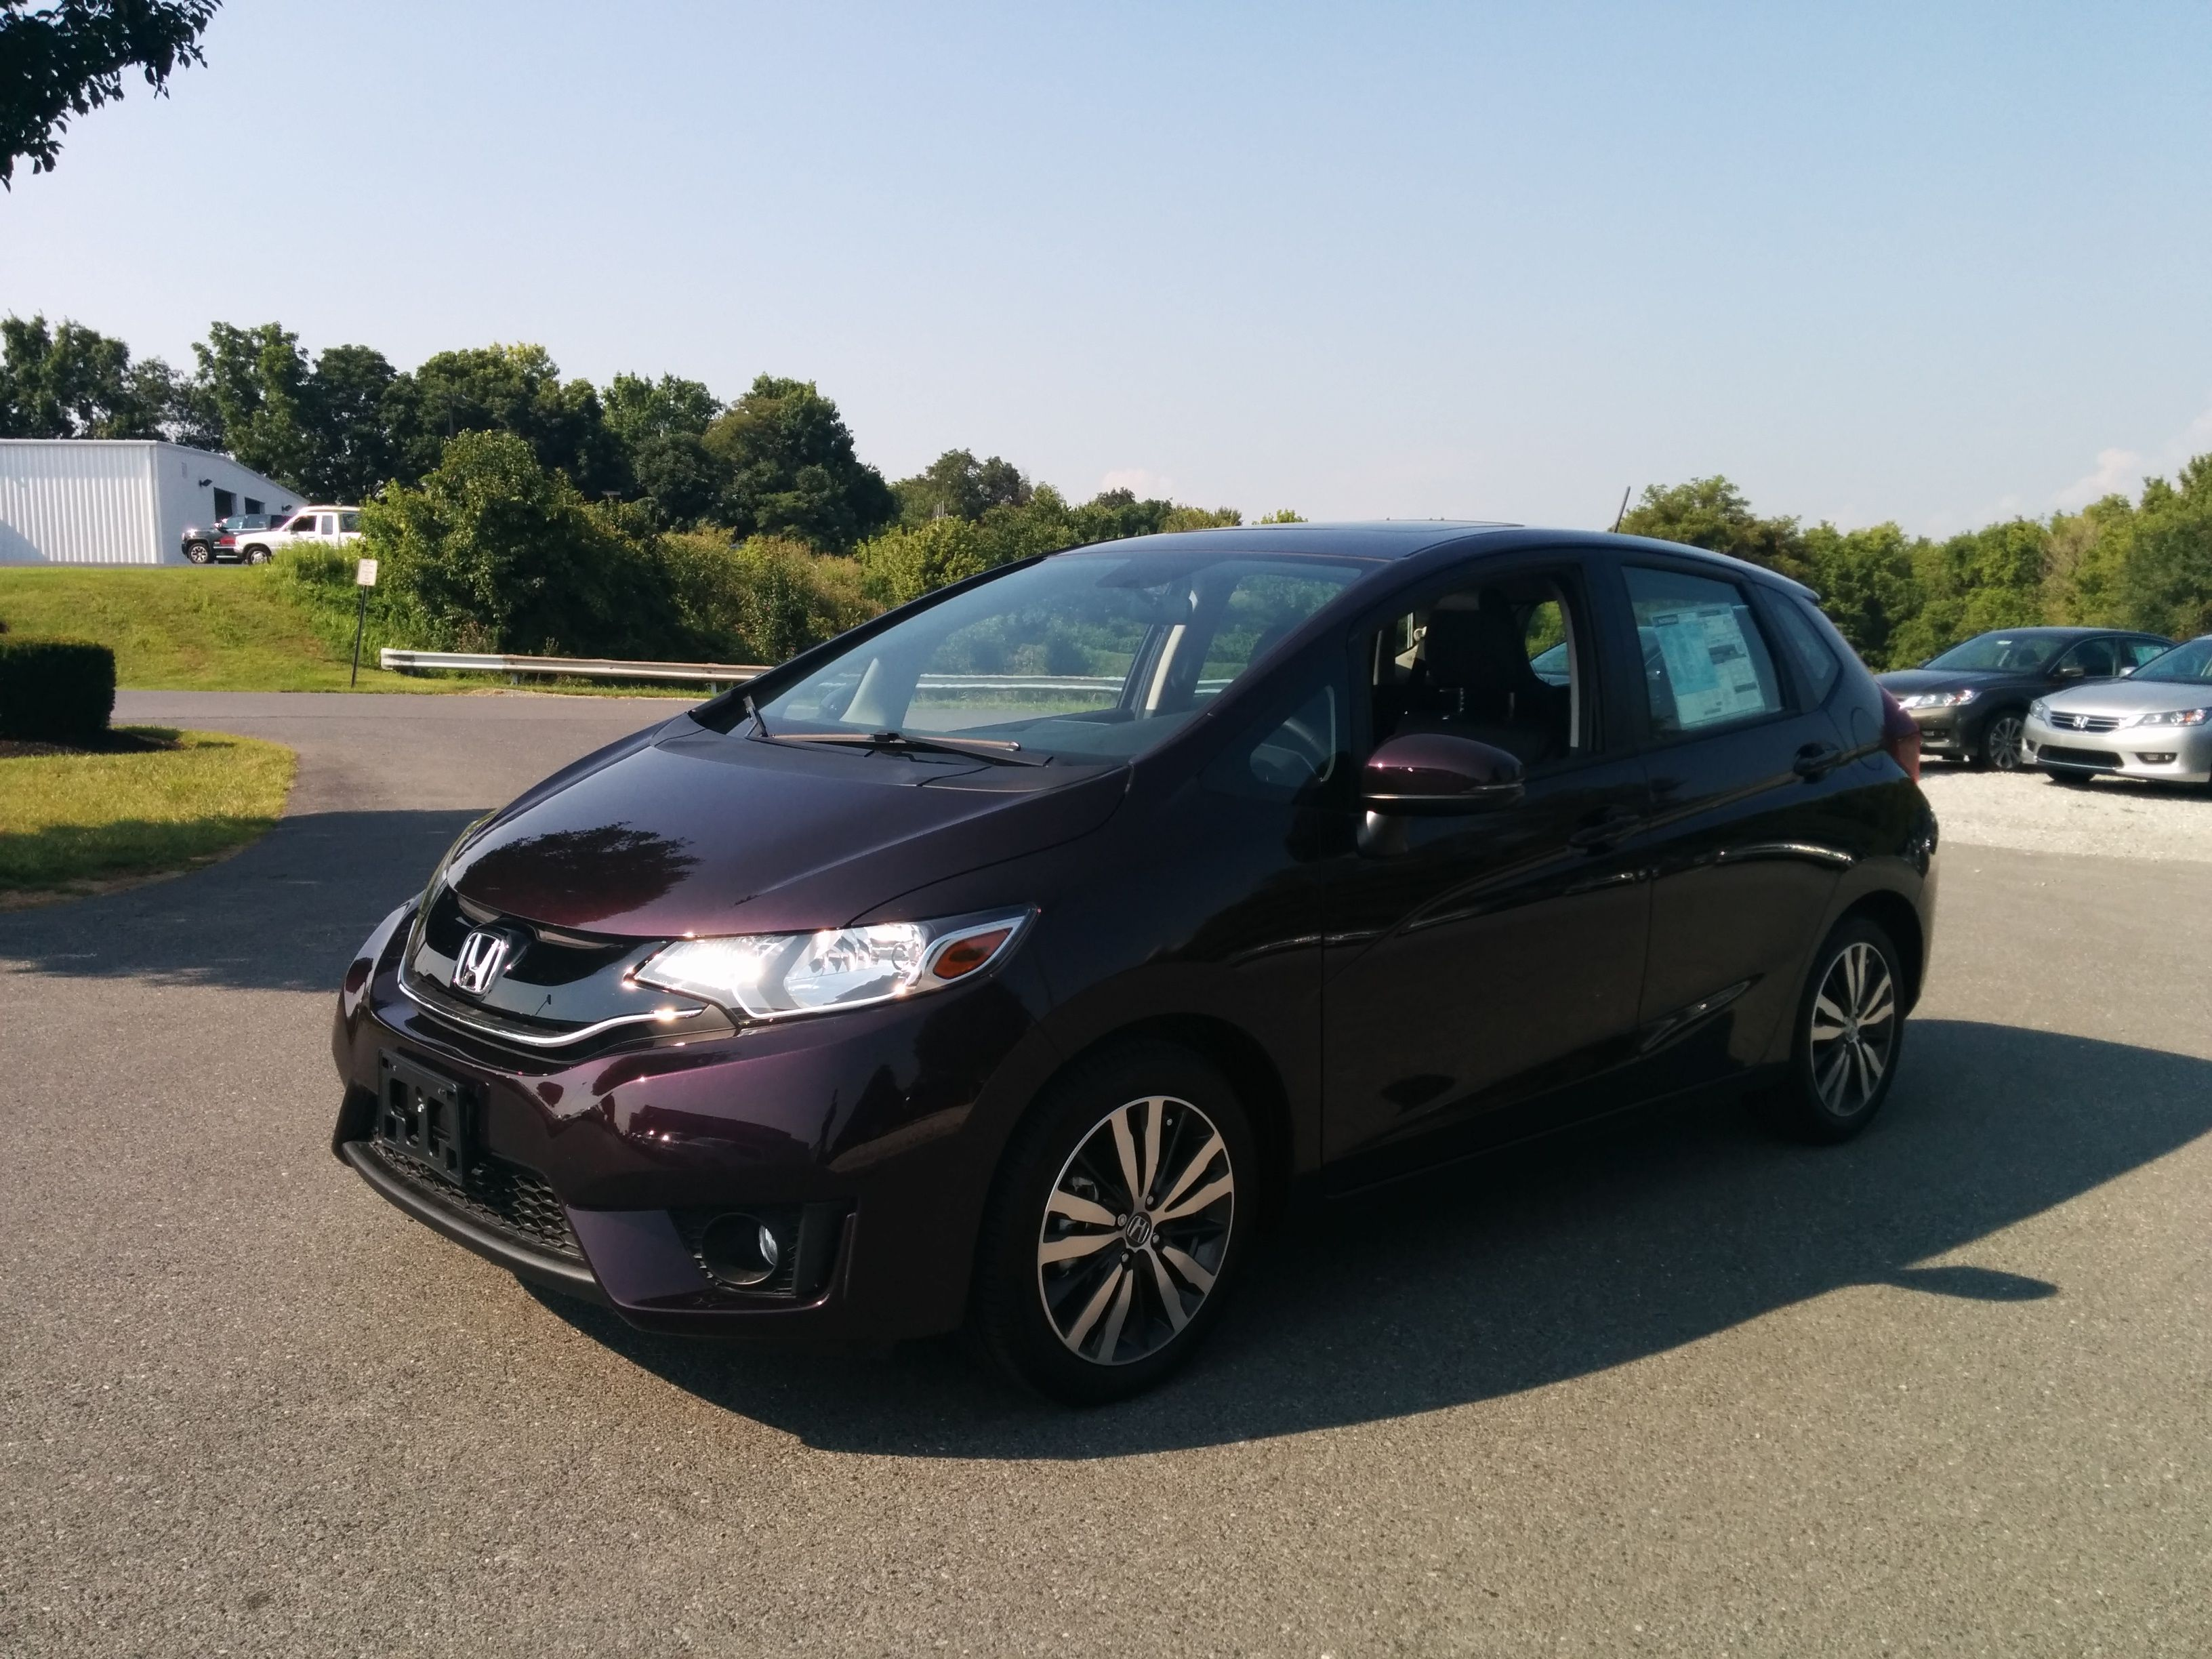 2015 Honda Fit EX L CVT w Navigation in Passion Berry Pearl